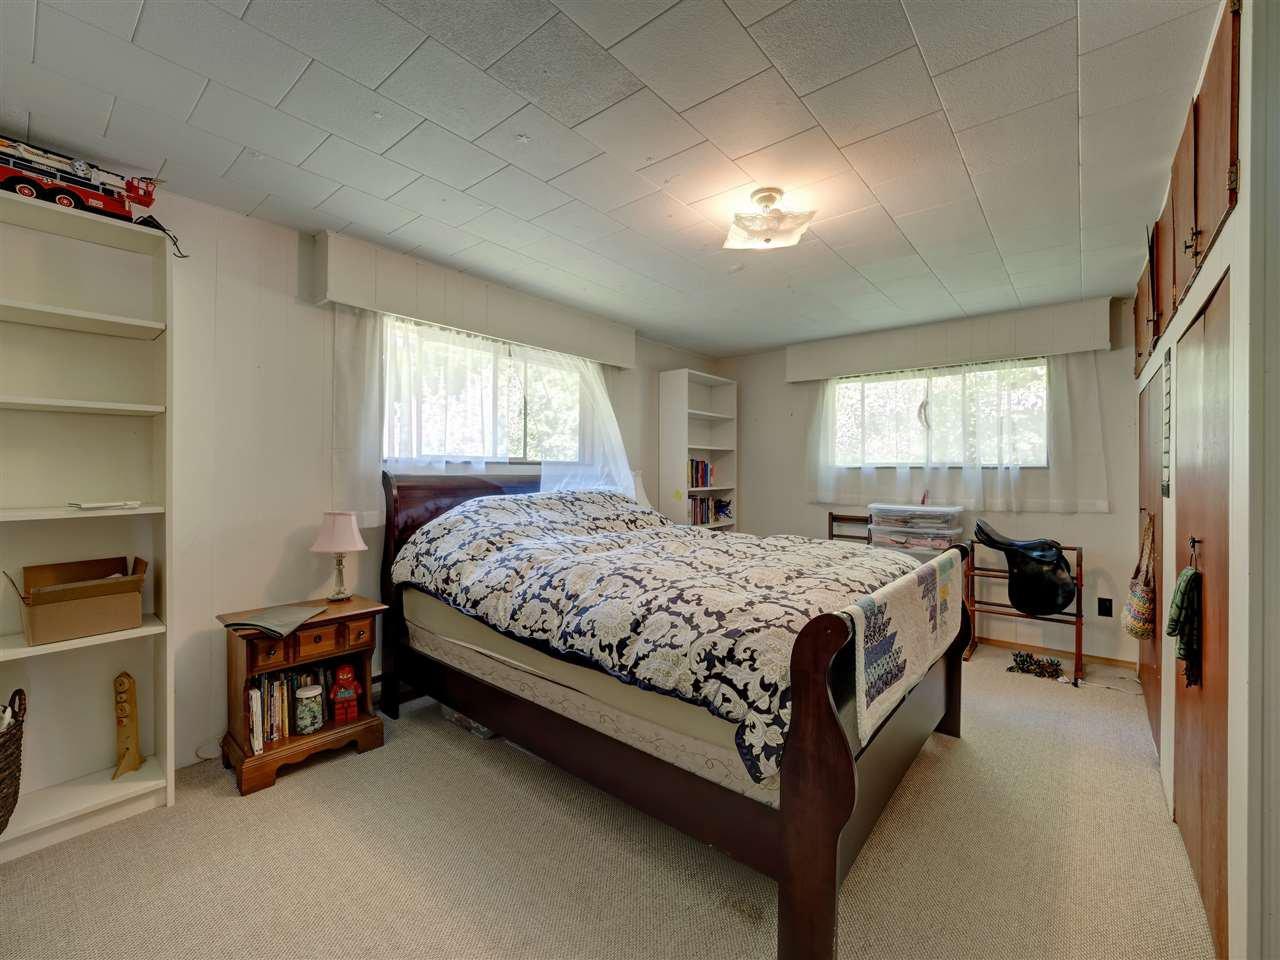 Photo 17: Photos: 5761 MCLAUGHAN Road in Sechelt: Sechelt District House for sale (Sunshine Coast)  : MLS®# R2479077